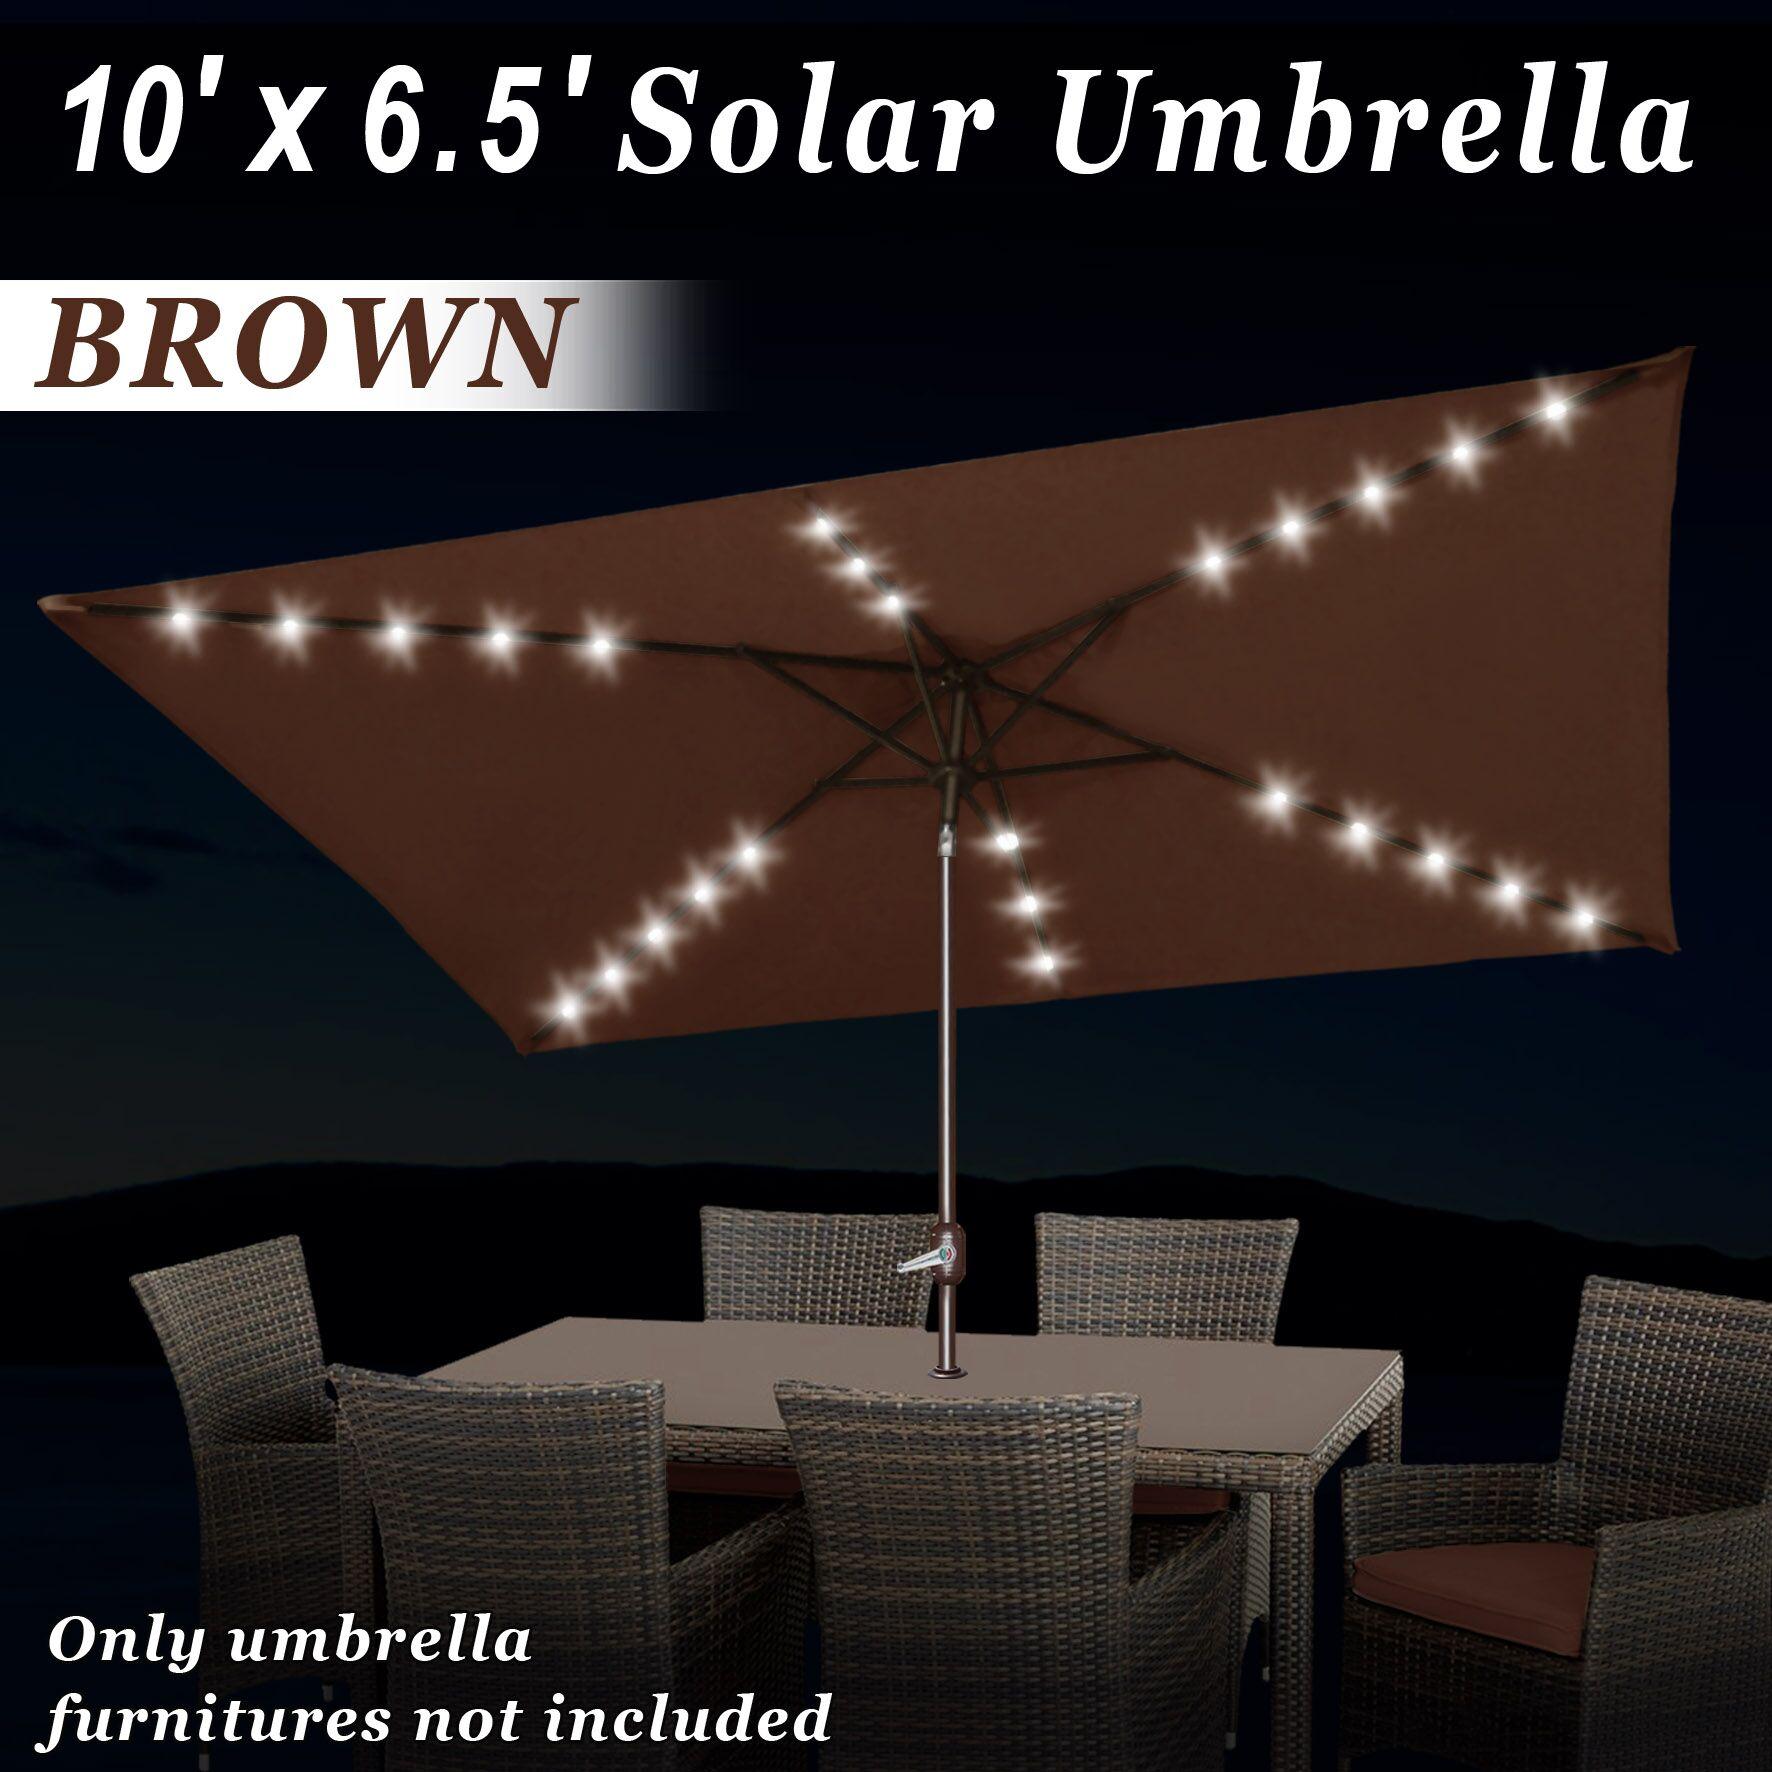 Eliana Solar Lighted Sunshade Tilt Crank 10' x 6'6